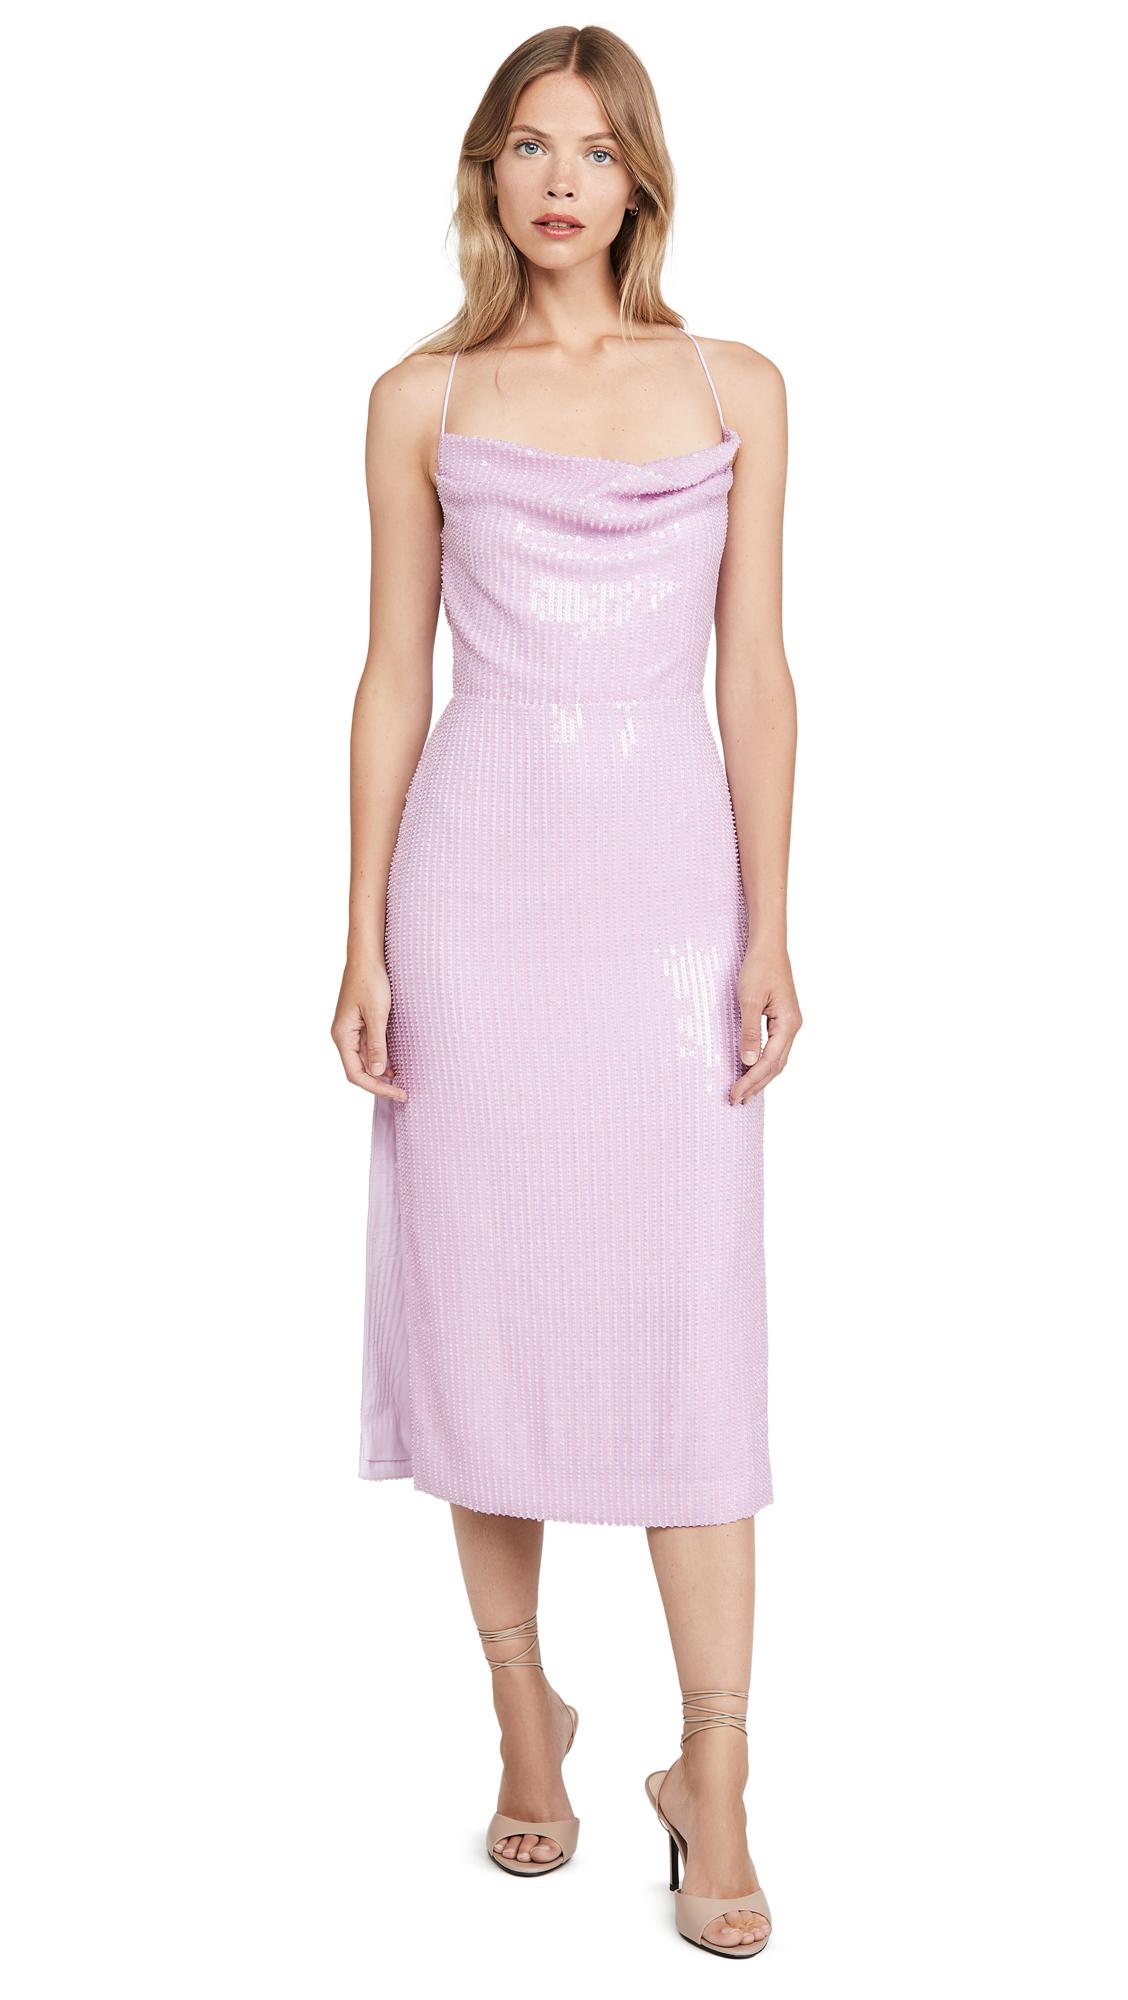 Misha Collection Devon Dress - 50% Off Sale